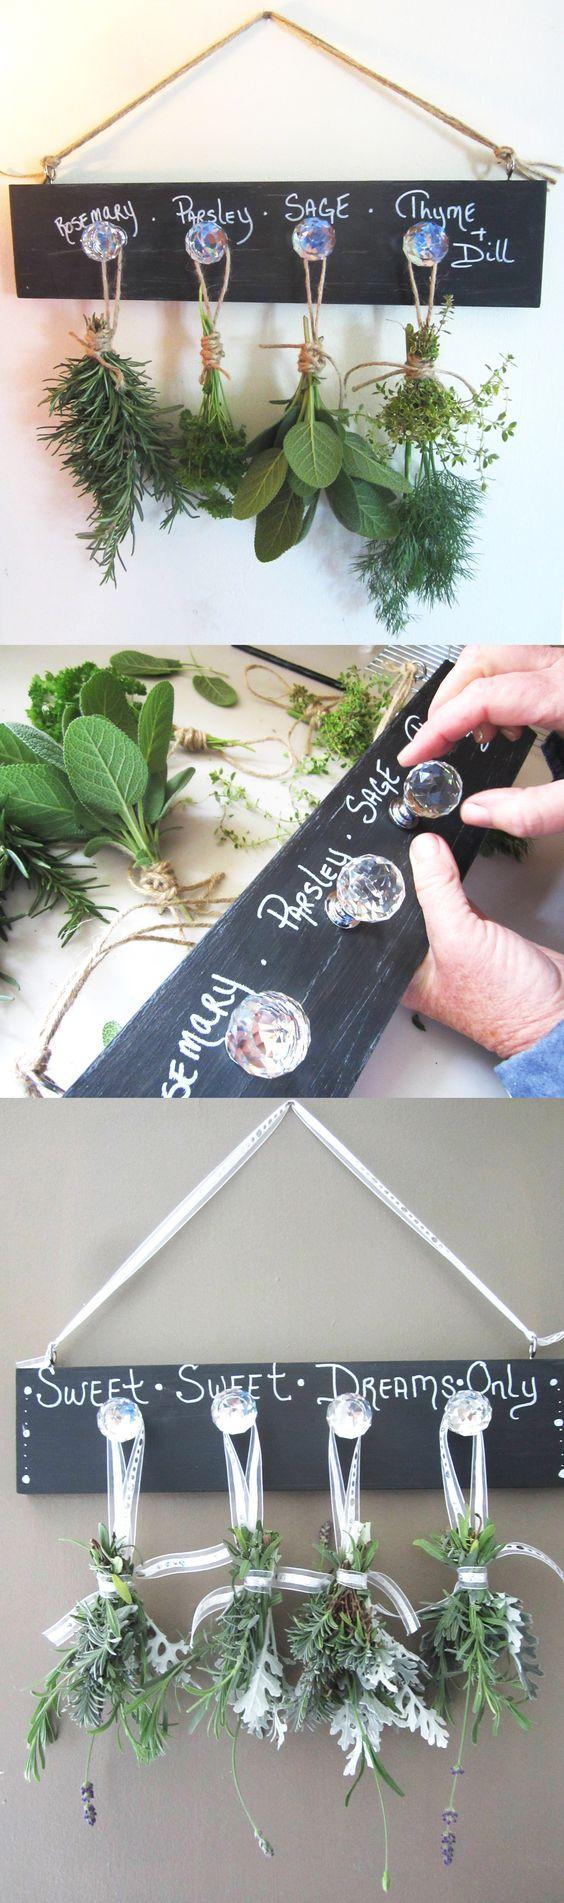 Easy DIY Herb Drying Rack | The Home Depot Community